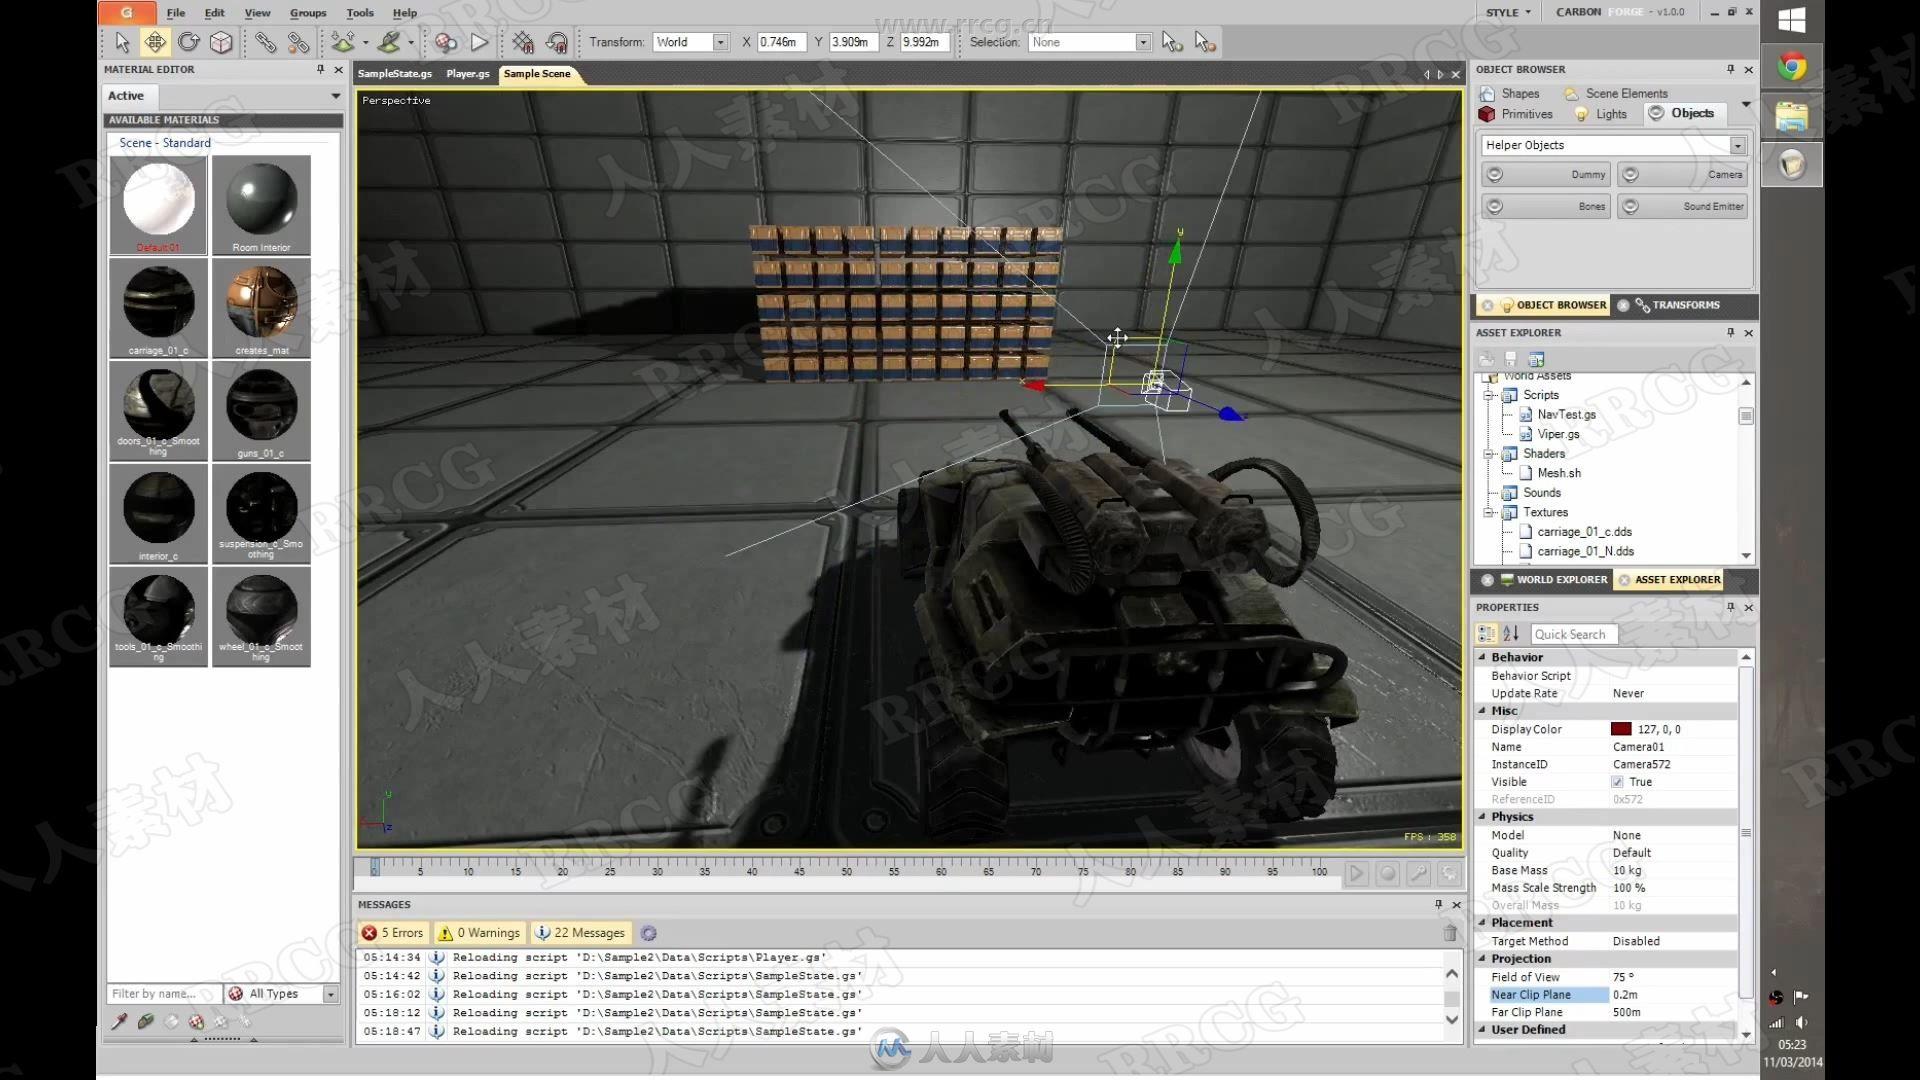 Carbon游戏引擎使用技术基础训练视频教程